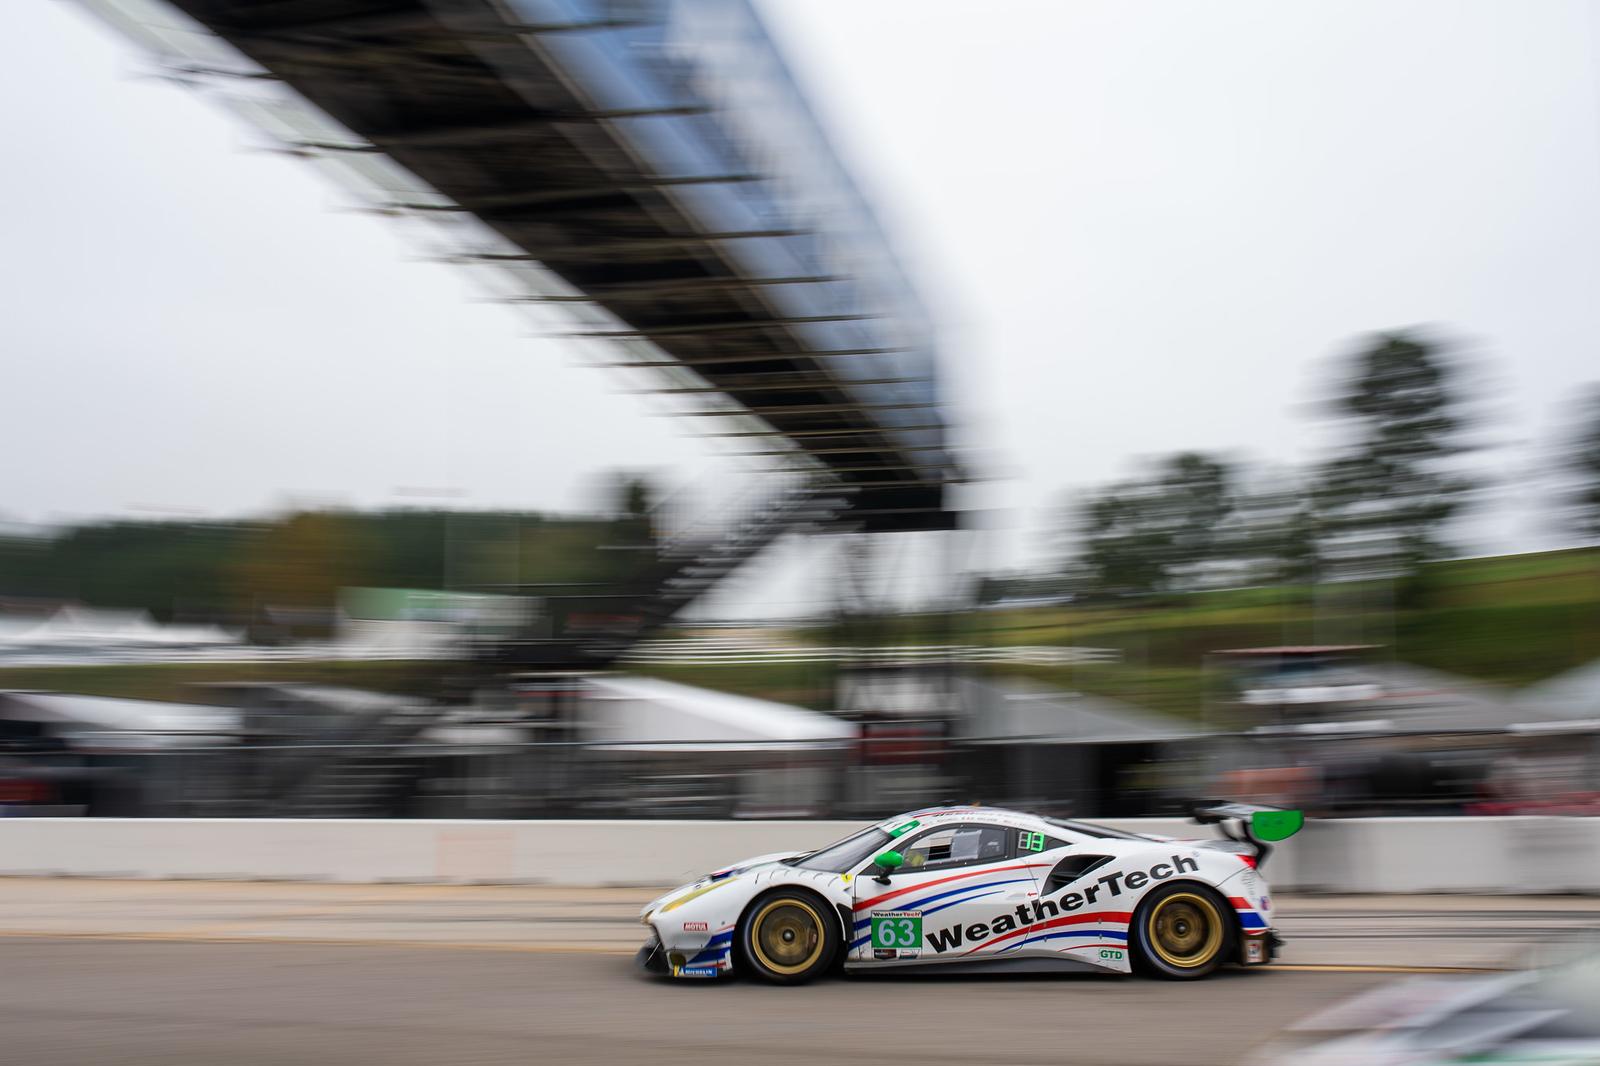 Car on track.